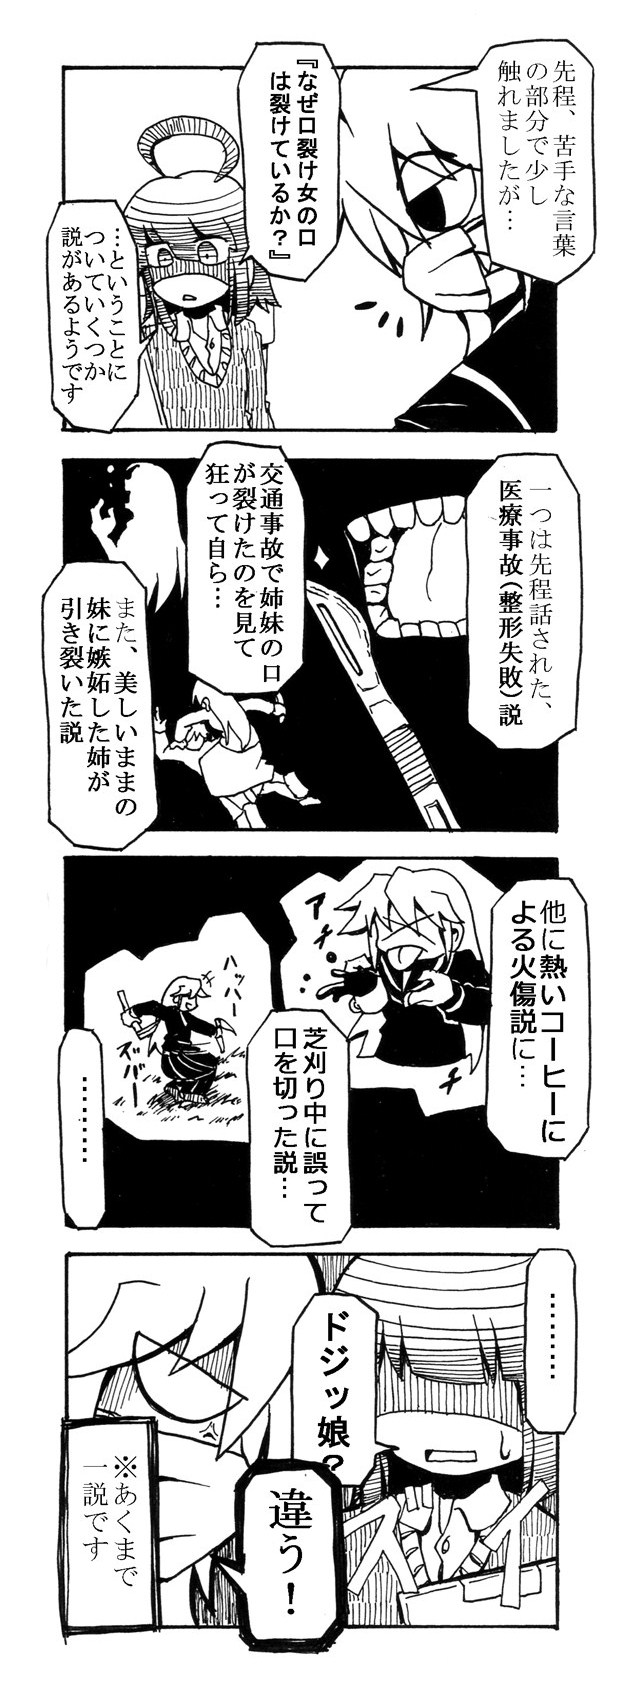 hanako6.jpg